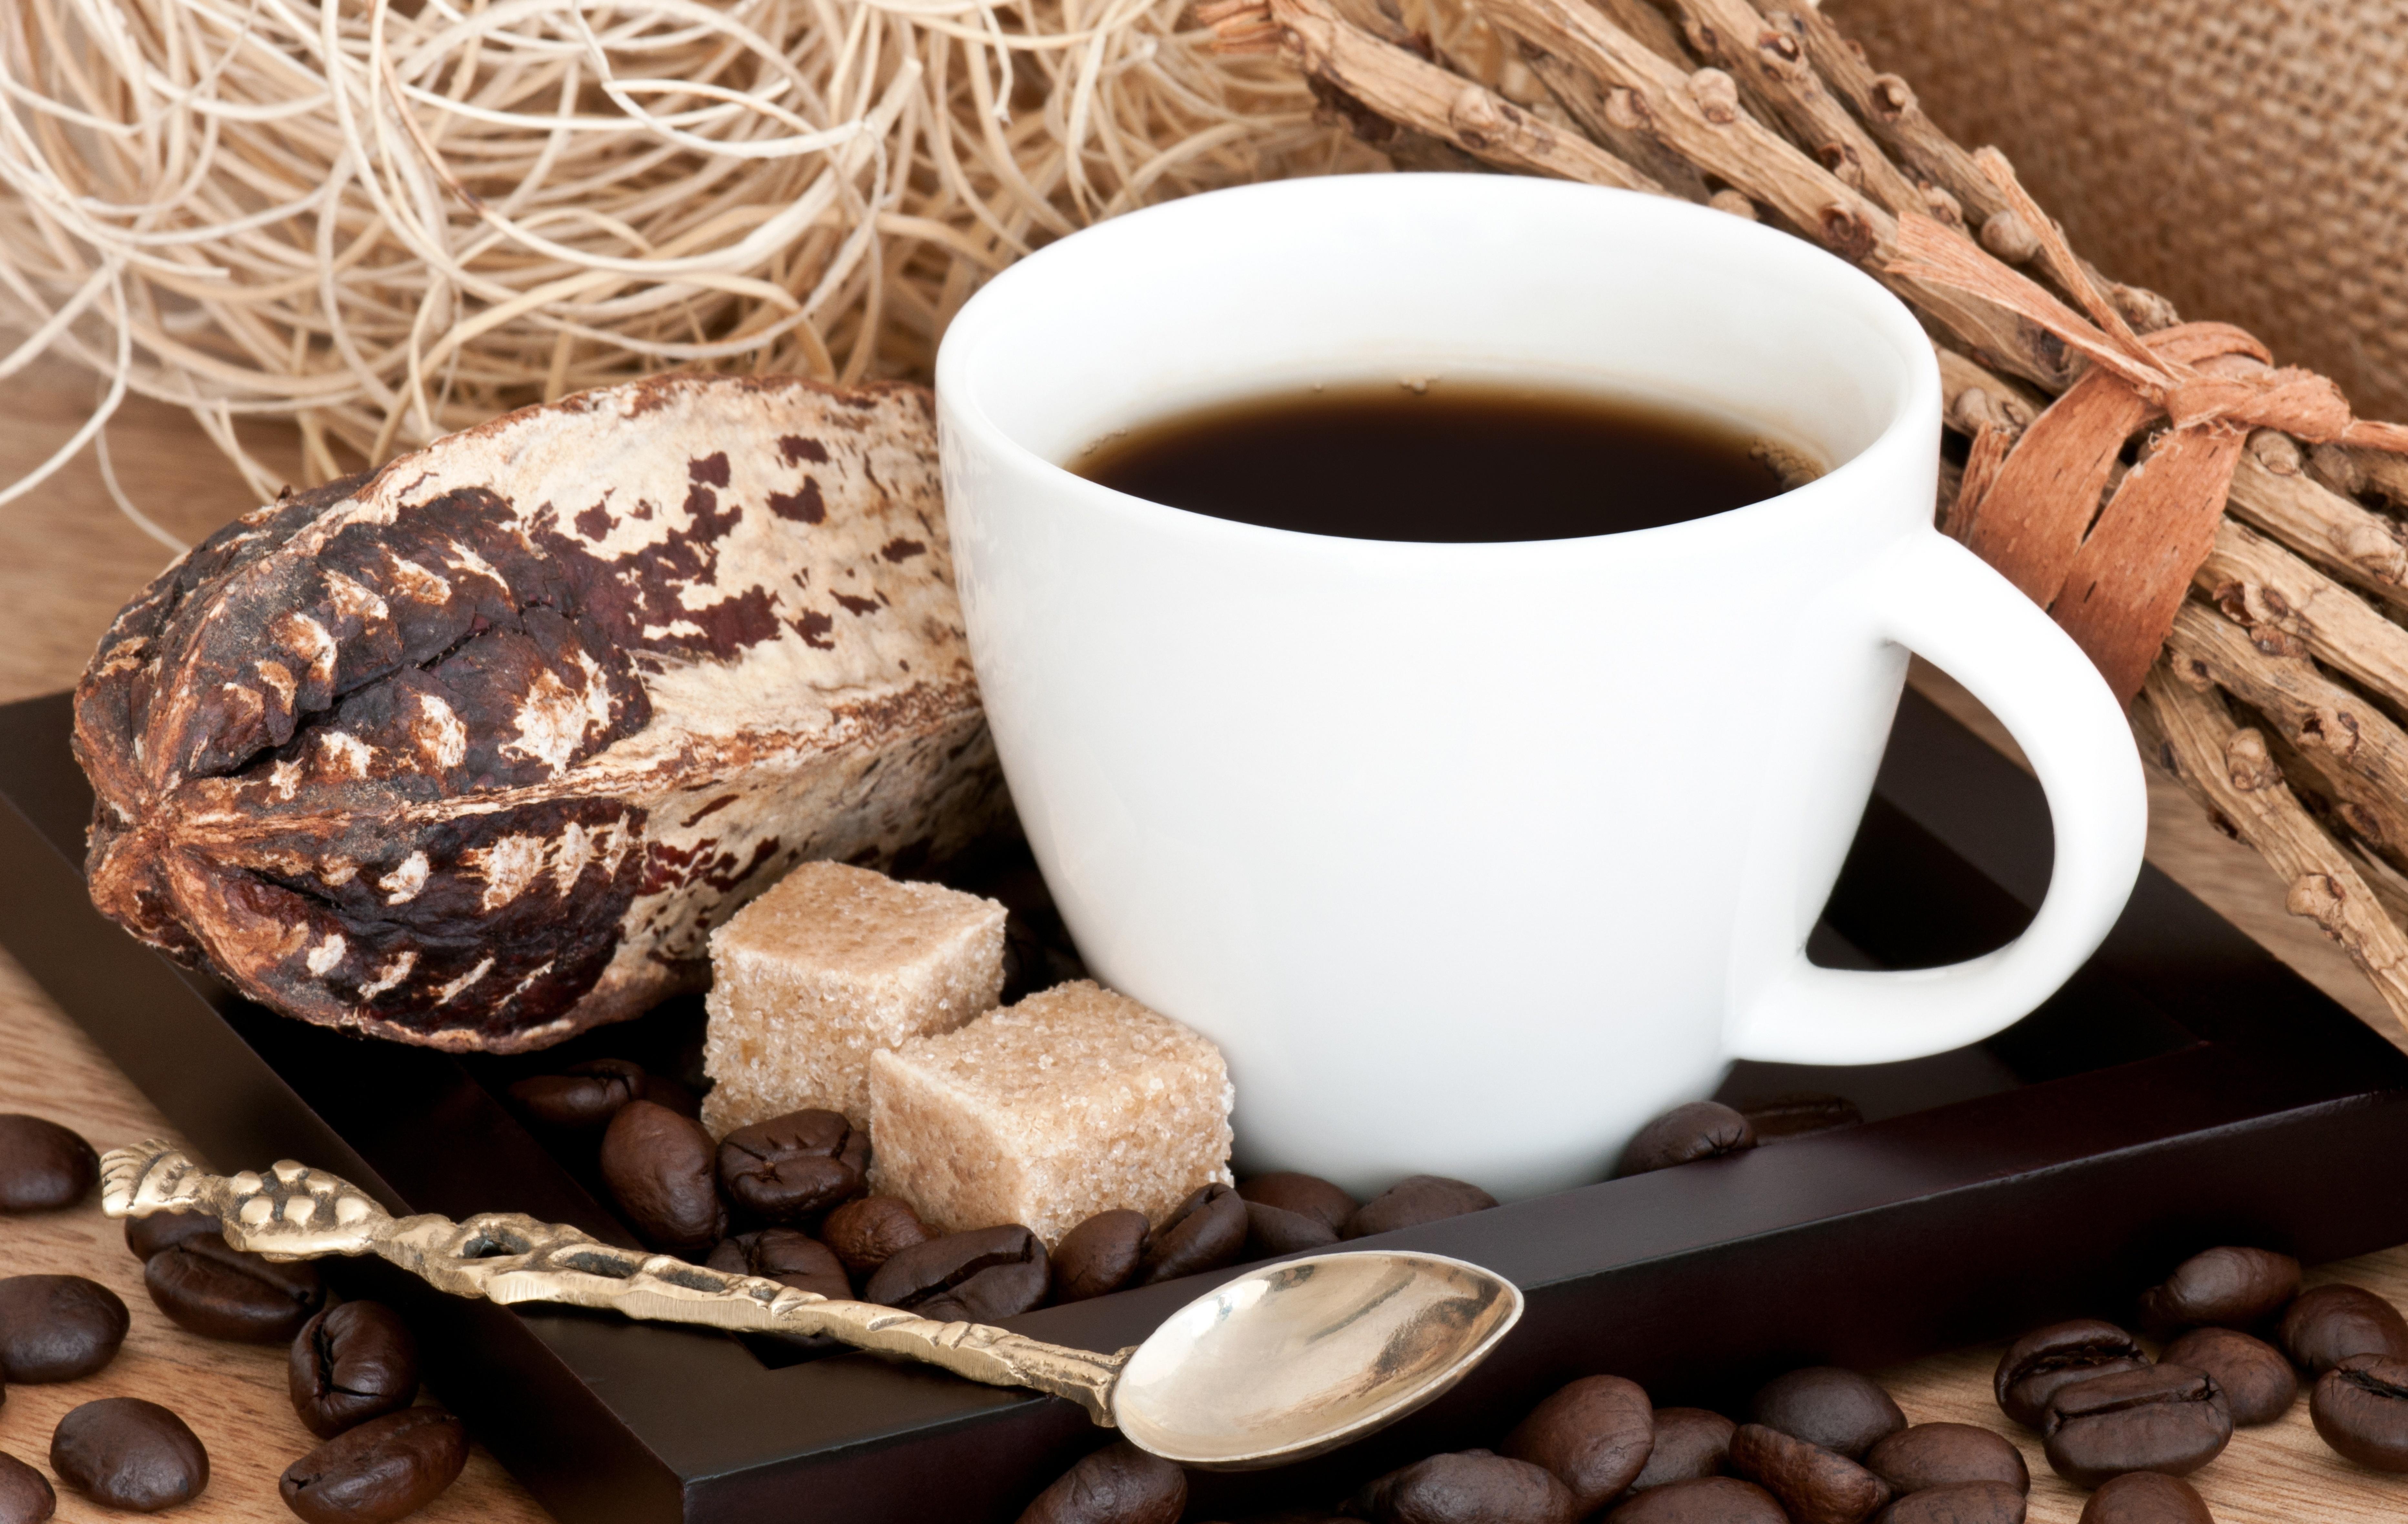 картинки чашек с сахаром тесто любит